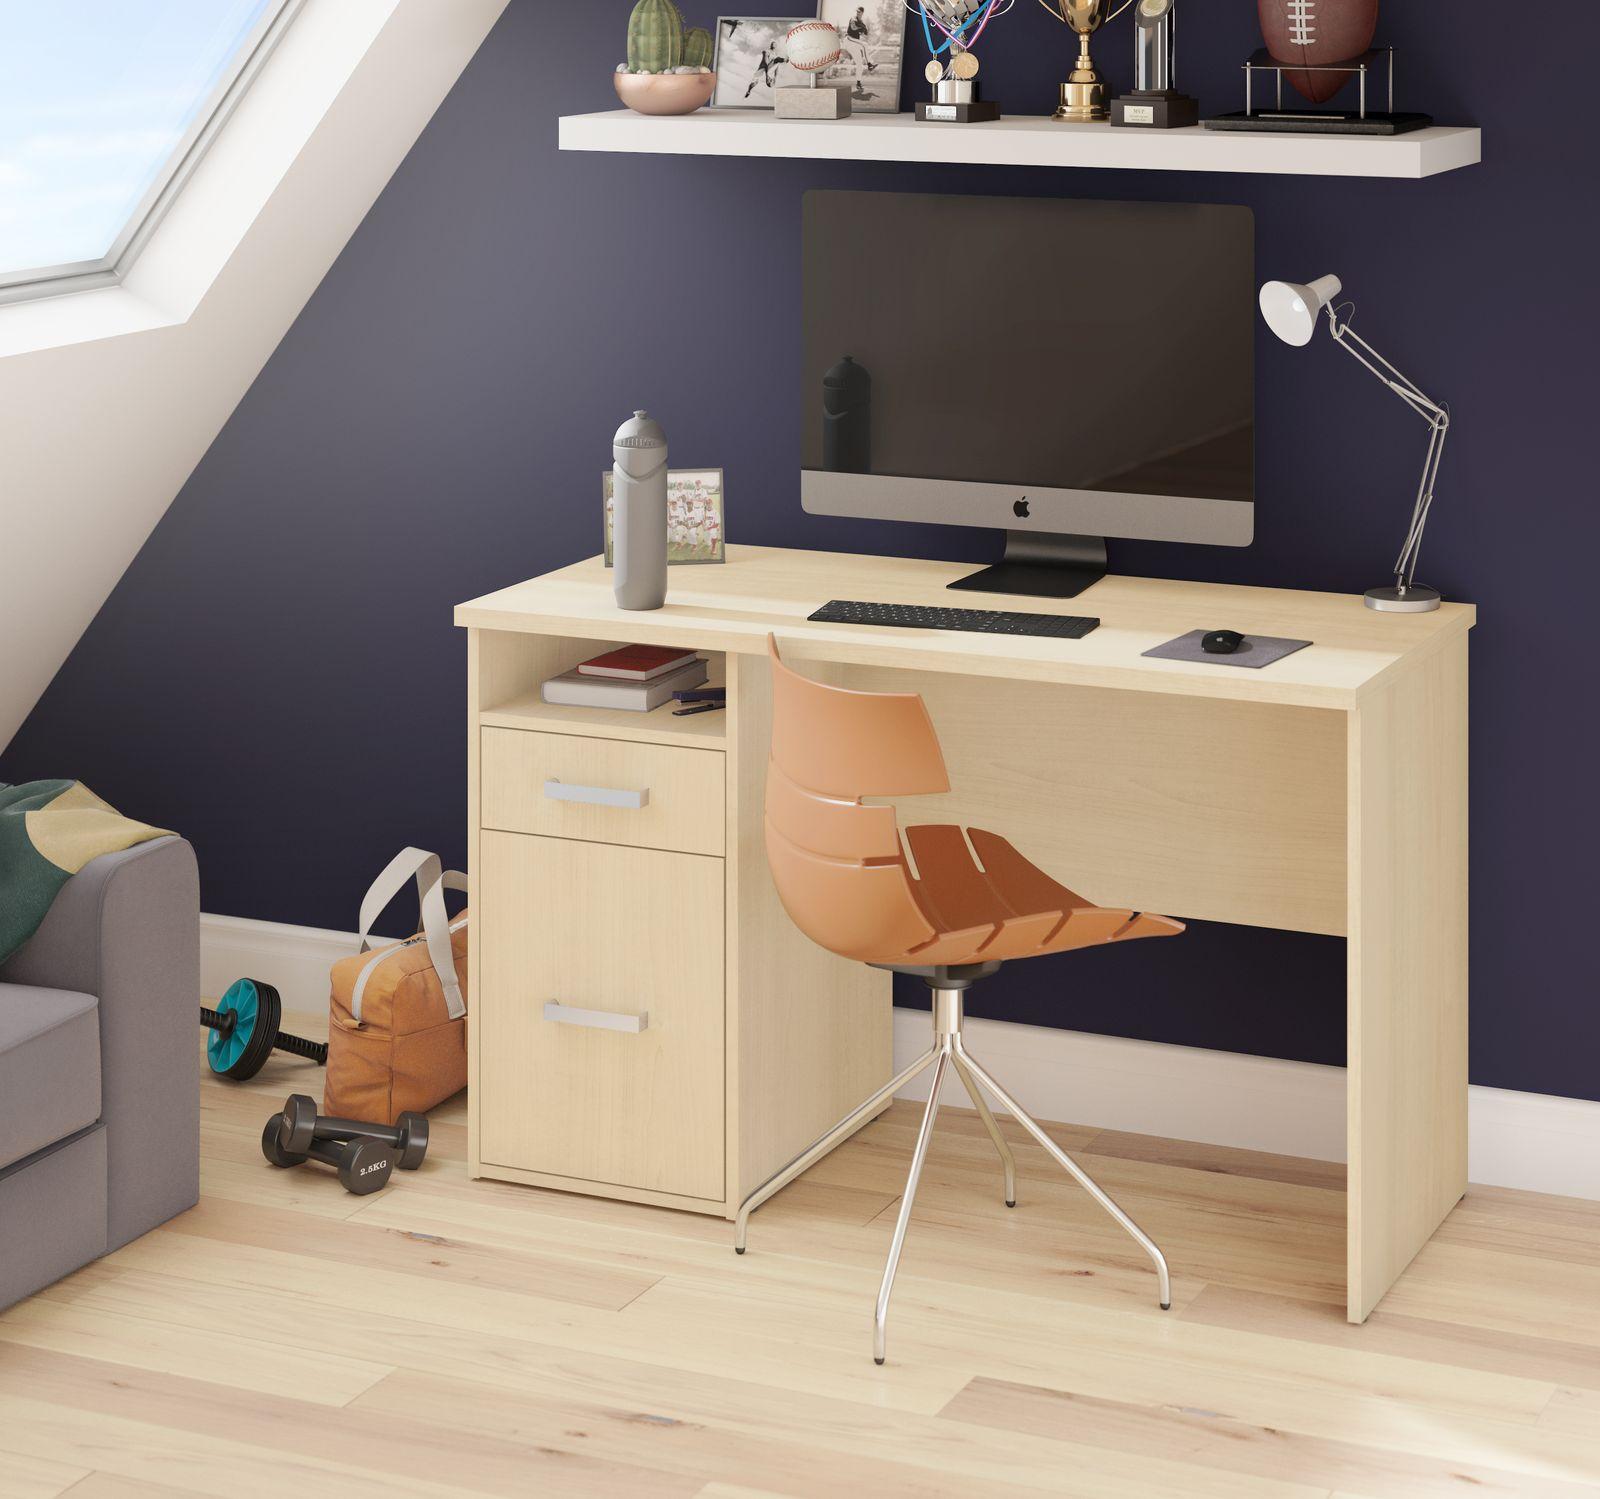 Petit bureau avec mur blue foncé